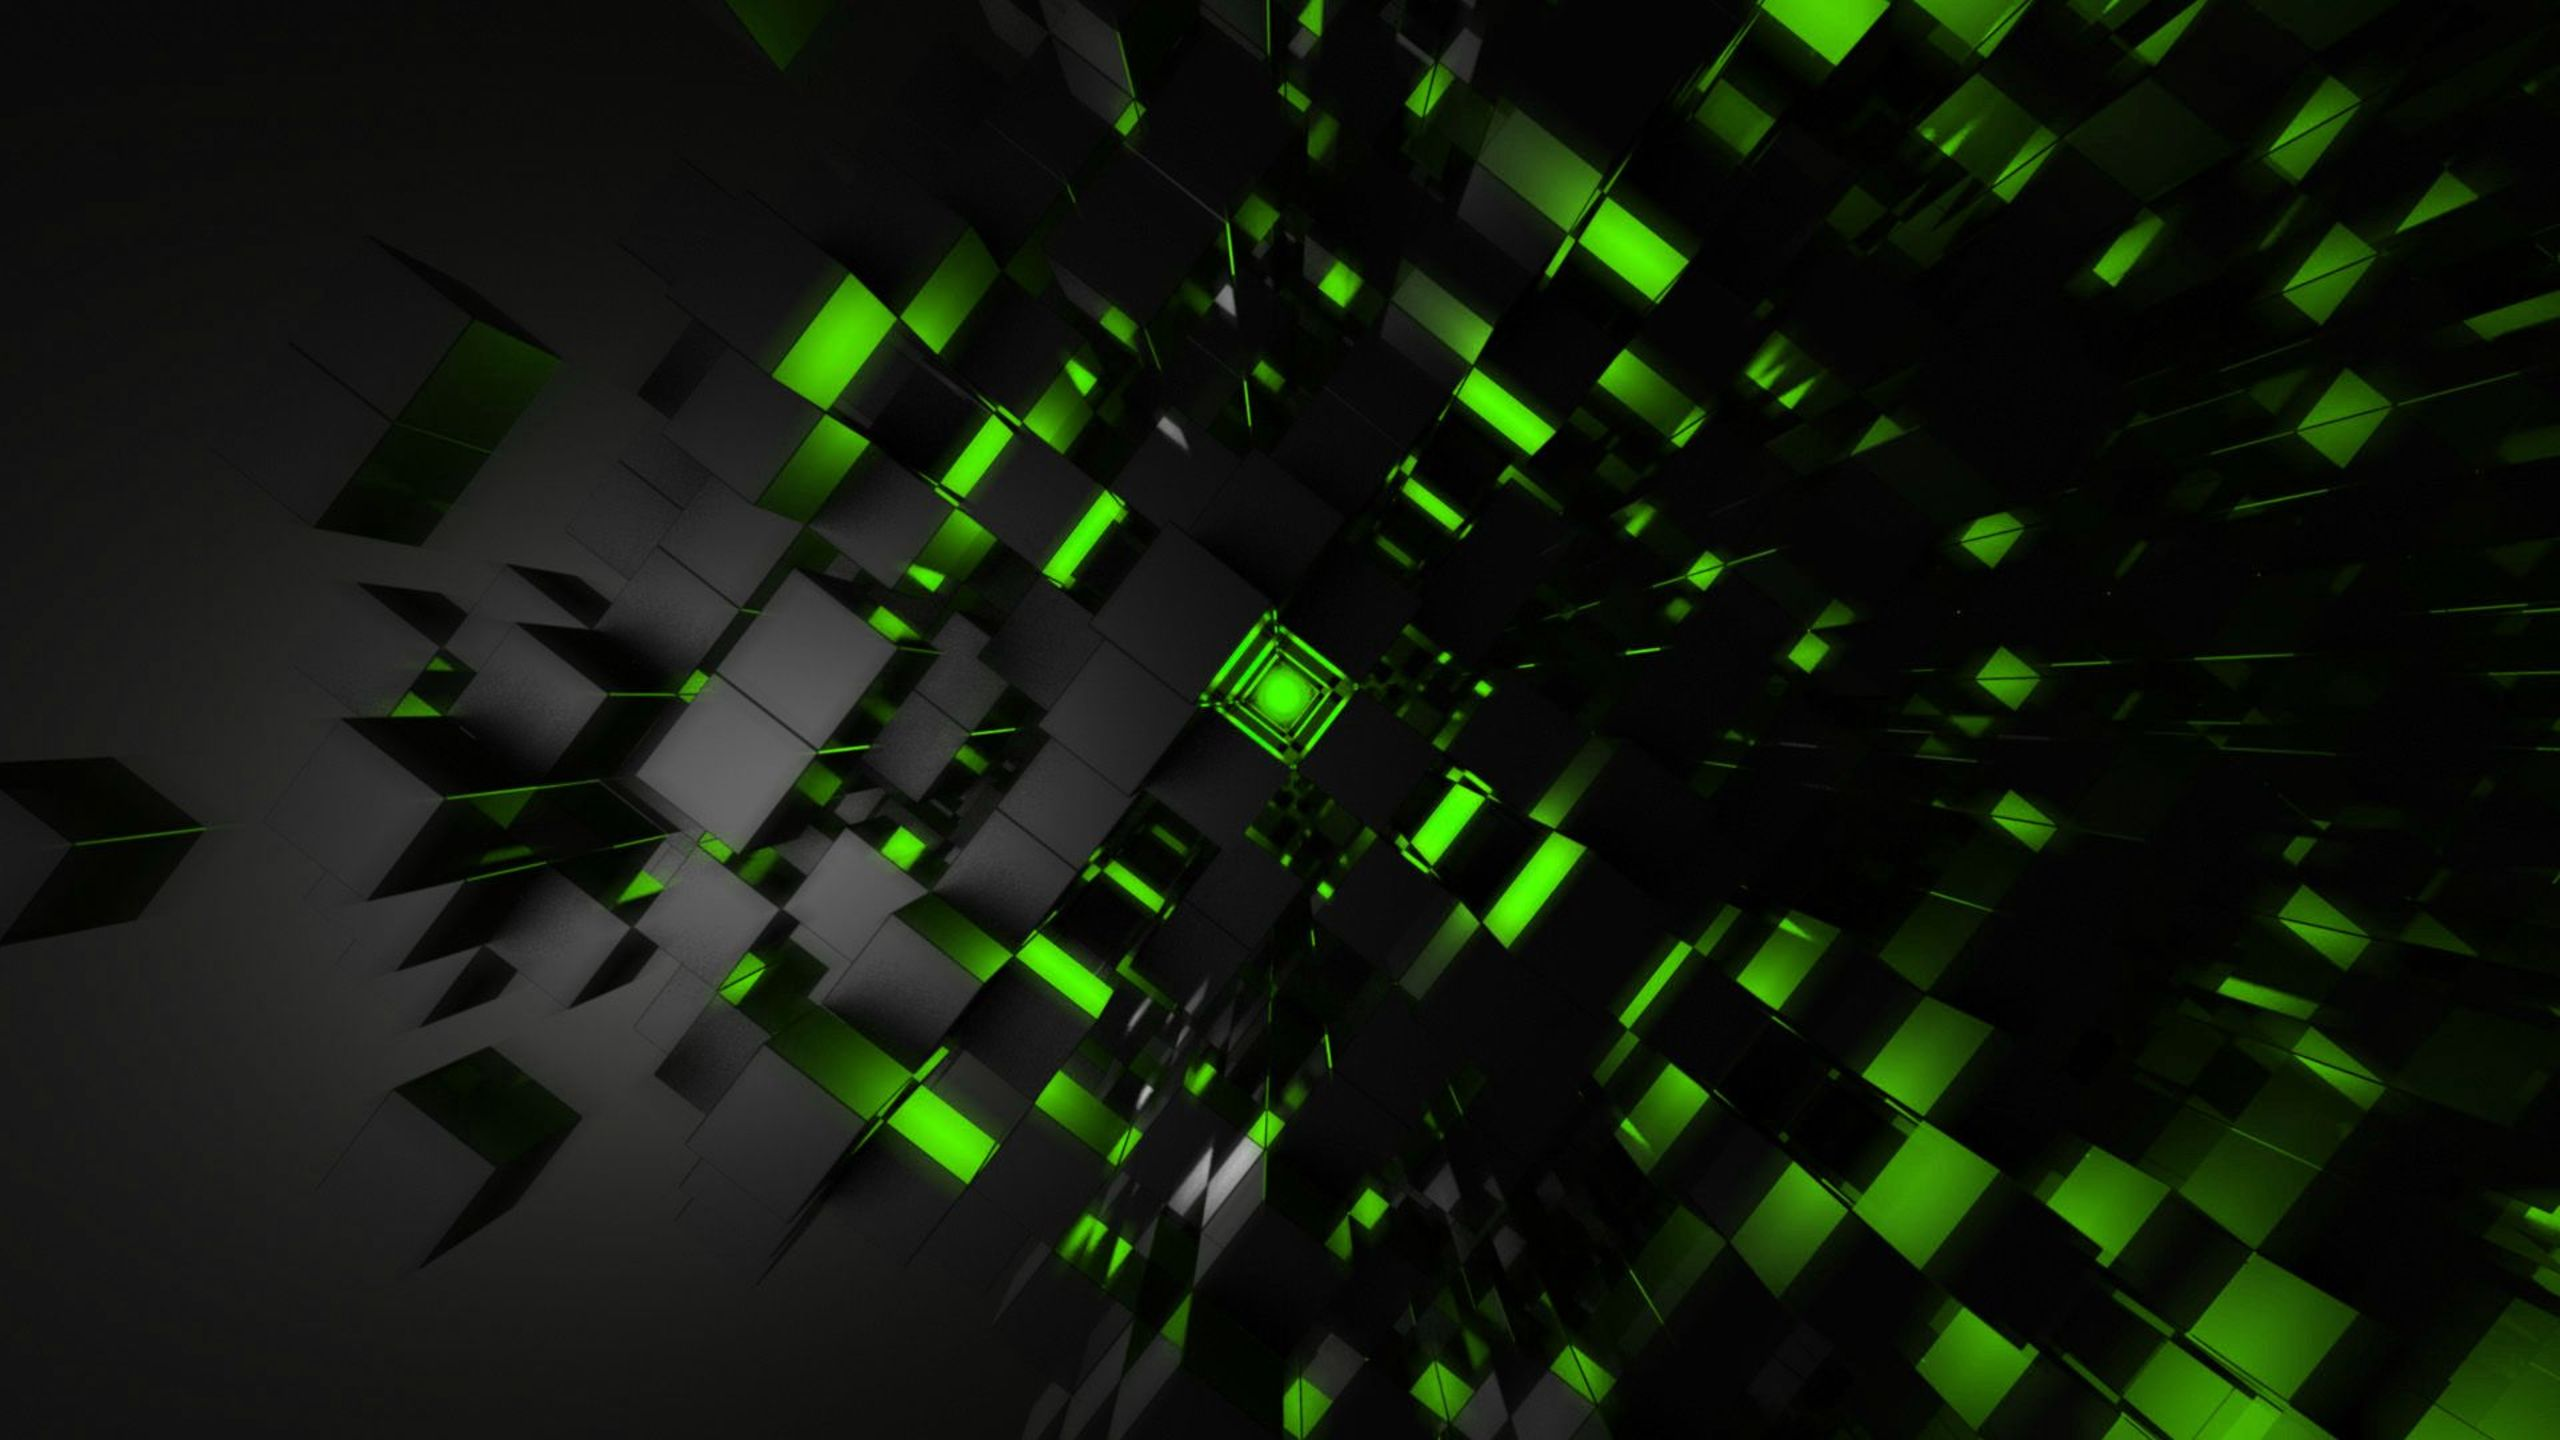 44 Neon Green Hd Wallpaper On Wallpapersafari